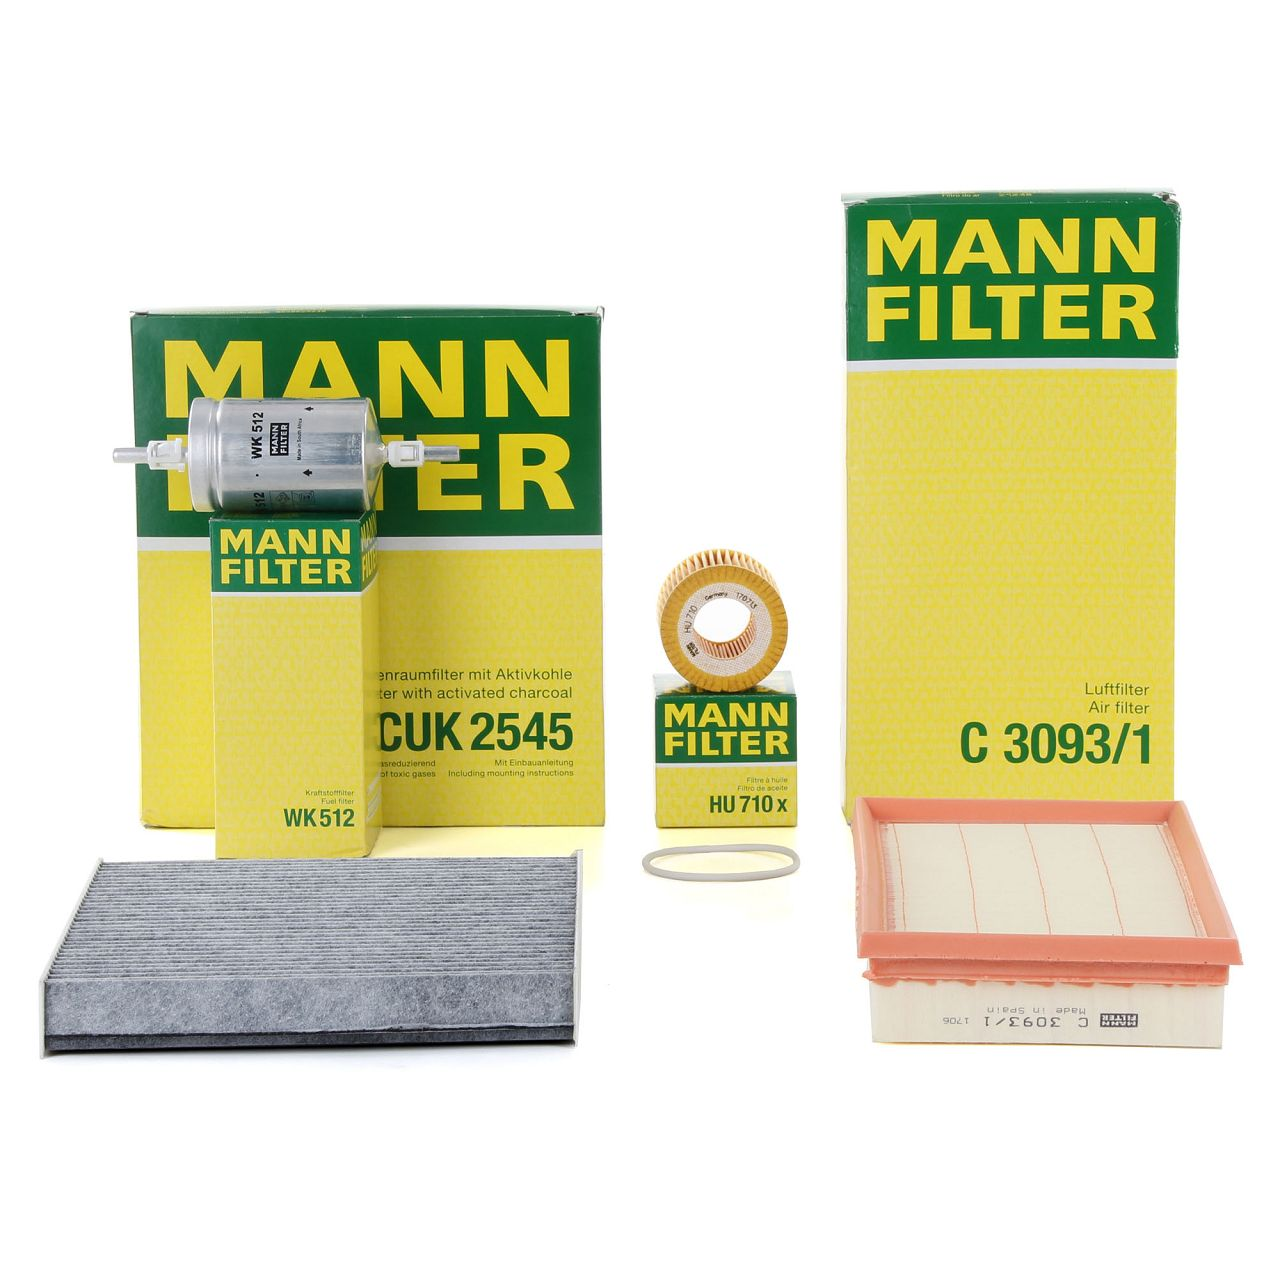 MANN Filterpaket Filterset für SEAT CORDOBA IBIZA IV SKODA FABIA I 1.2 64/70 PS